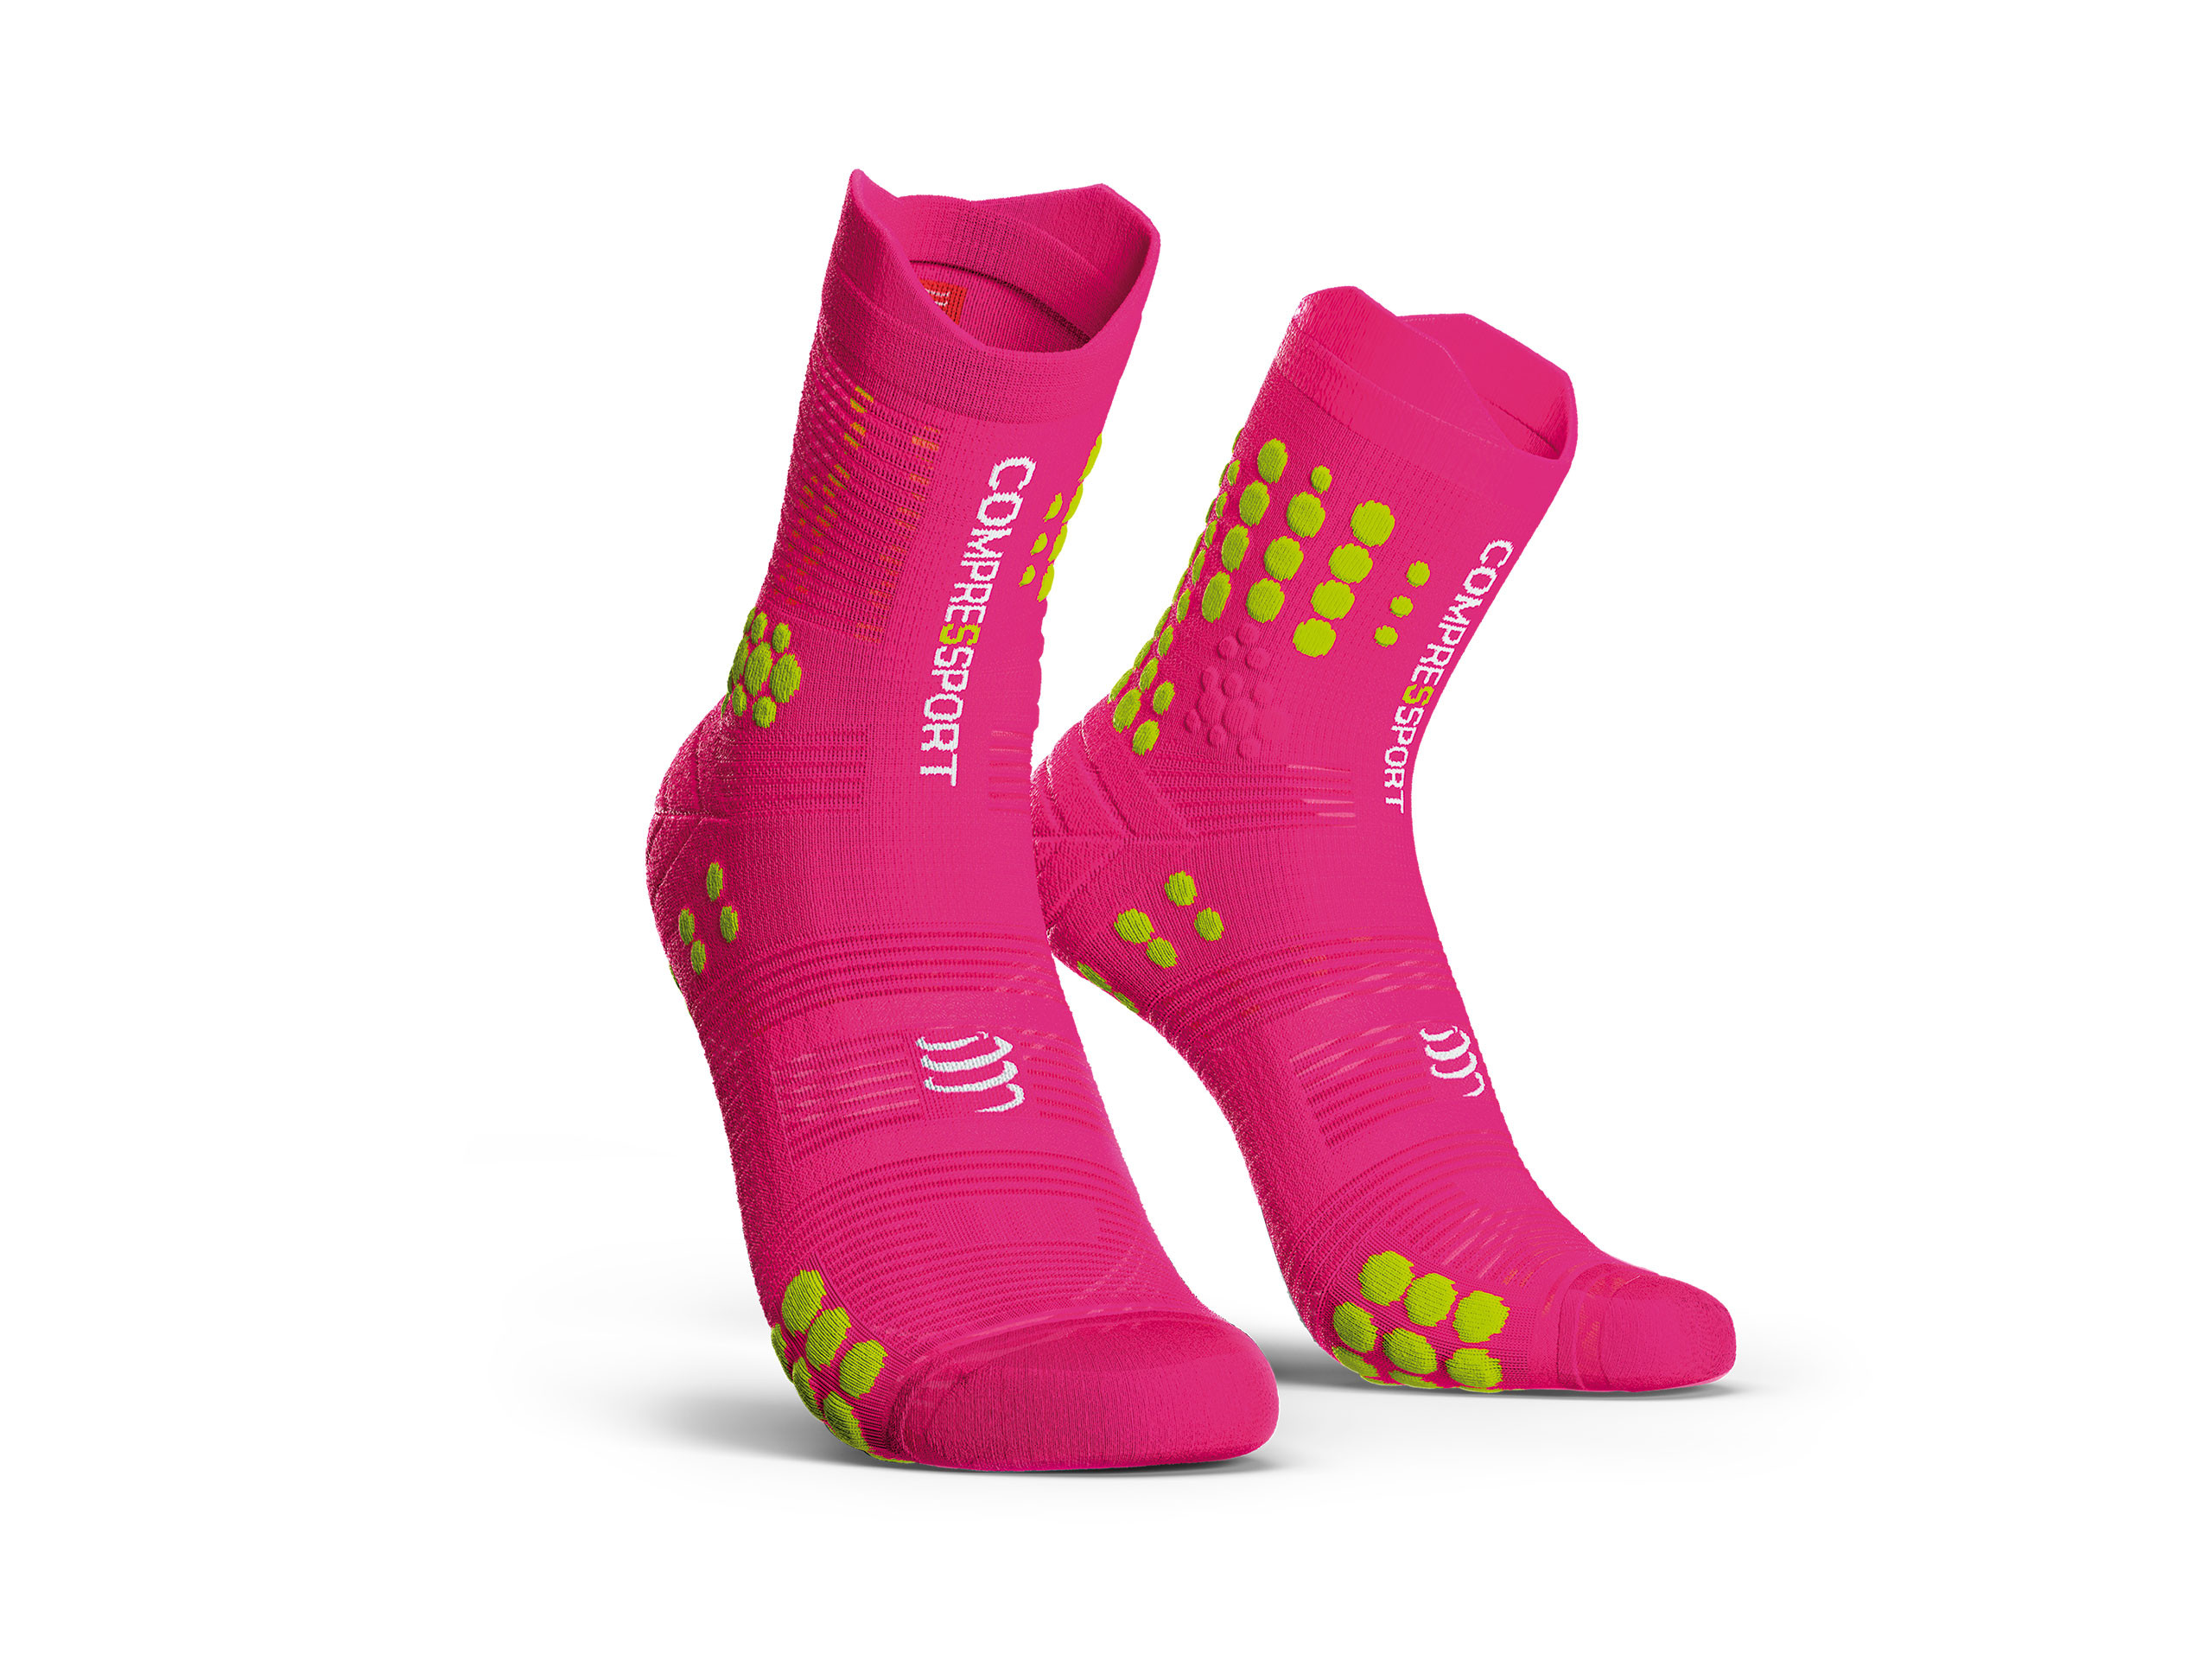 Calzini da gara professionali v3.0 rosa fluo